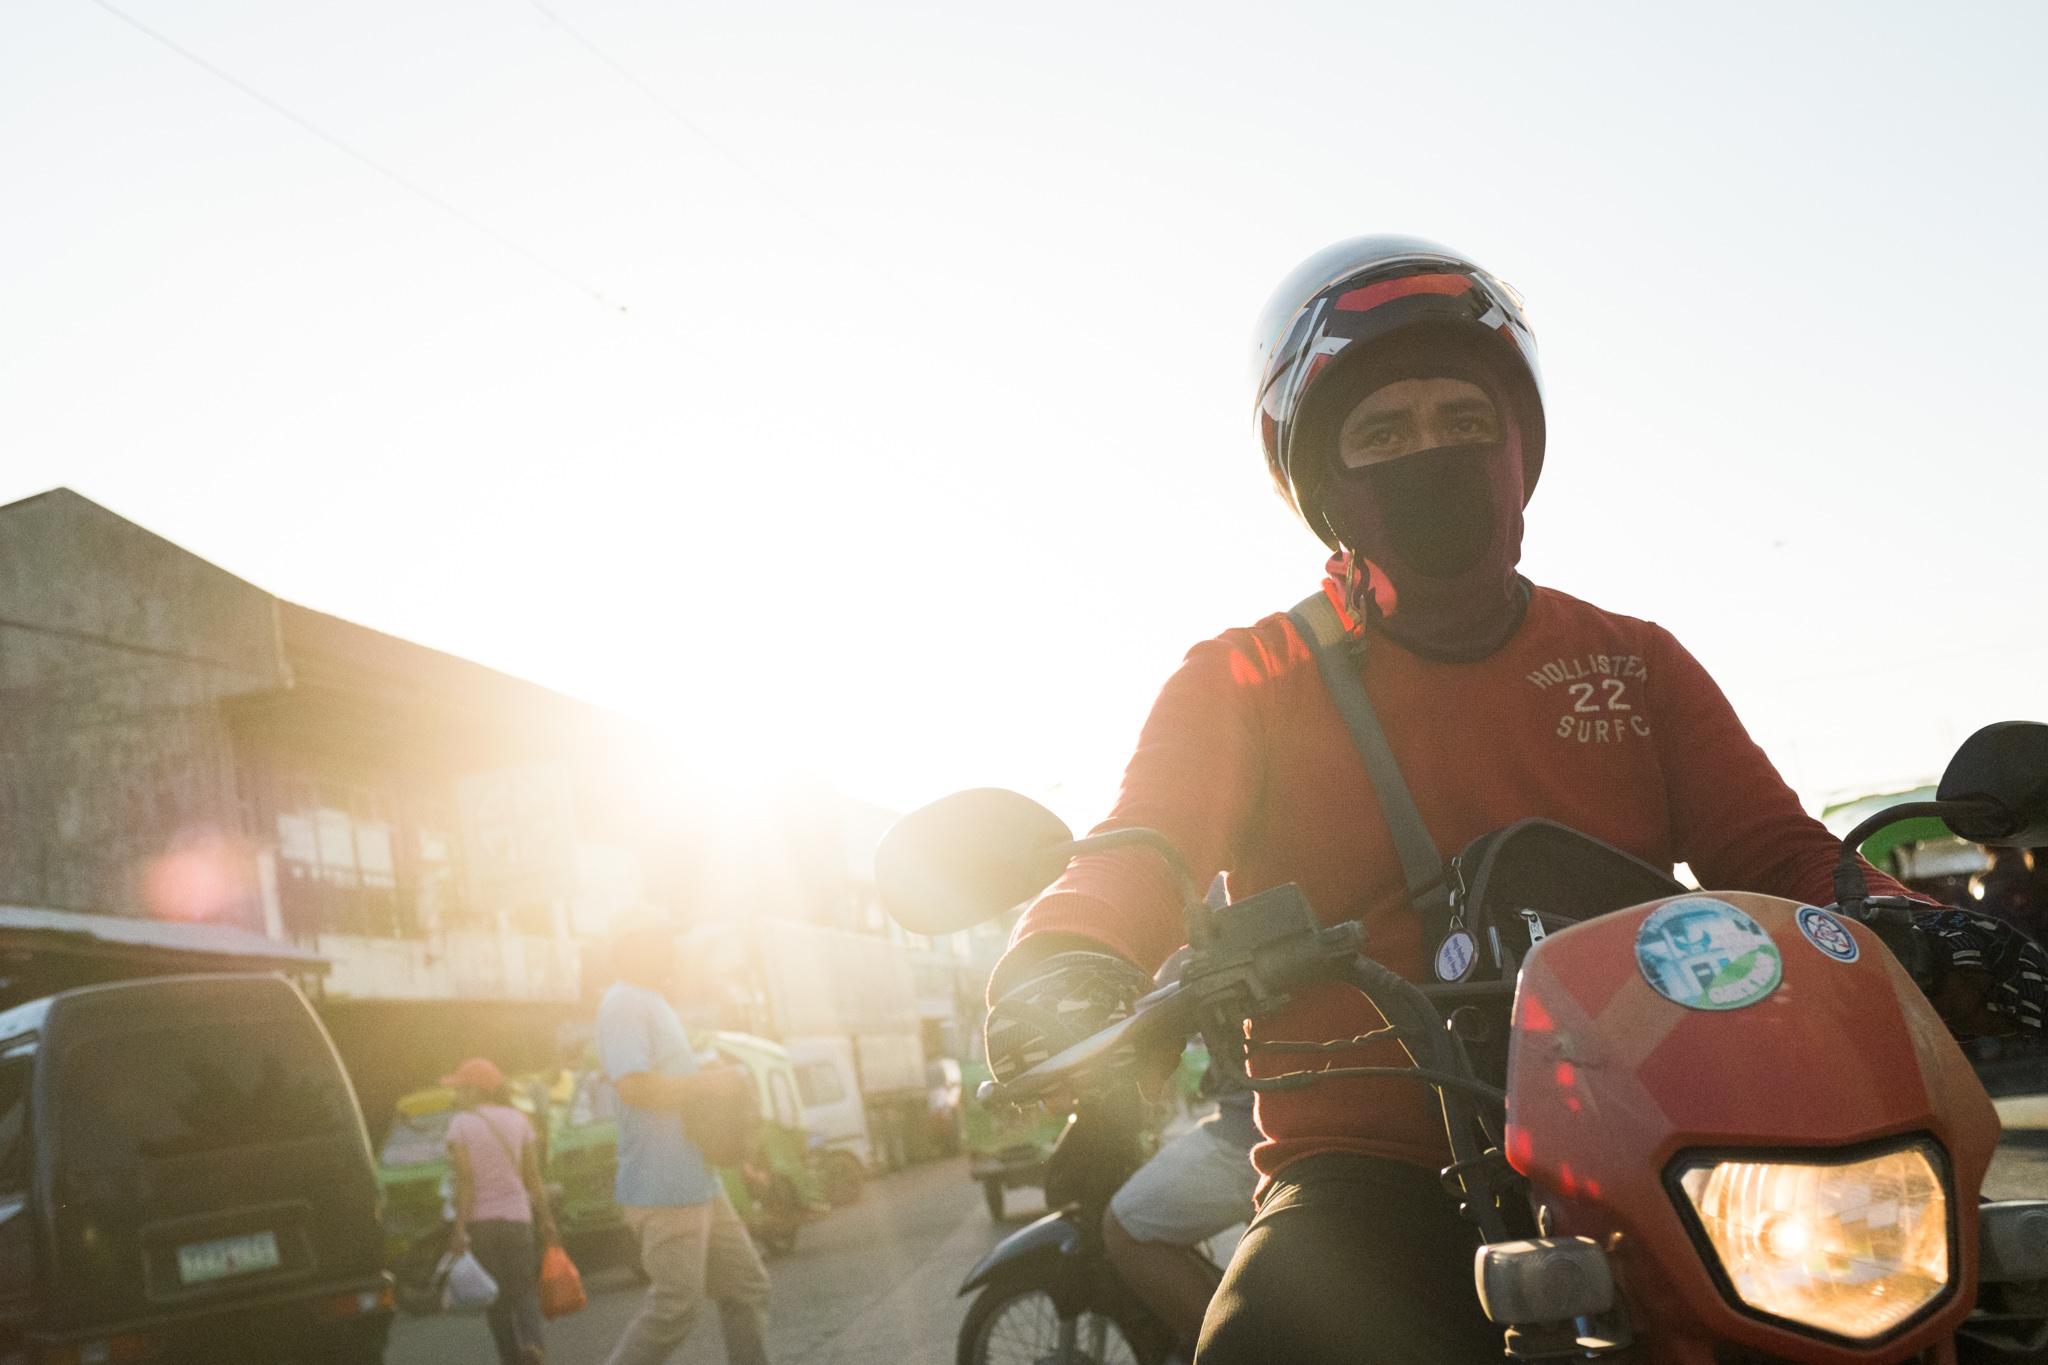 3159-philippines_scooter-biking.jpg